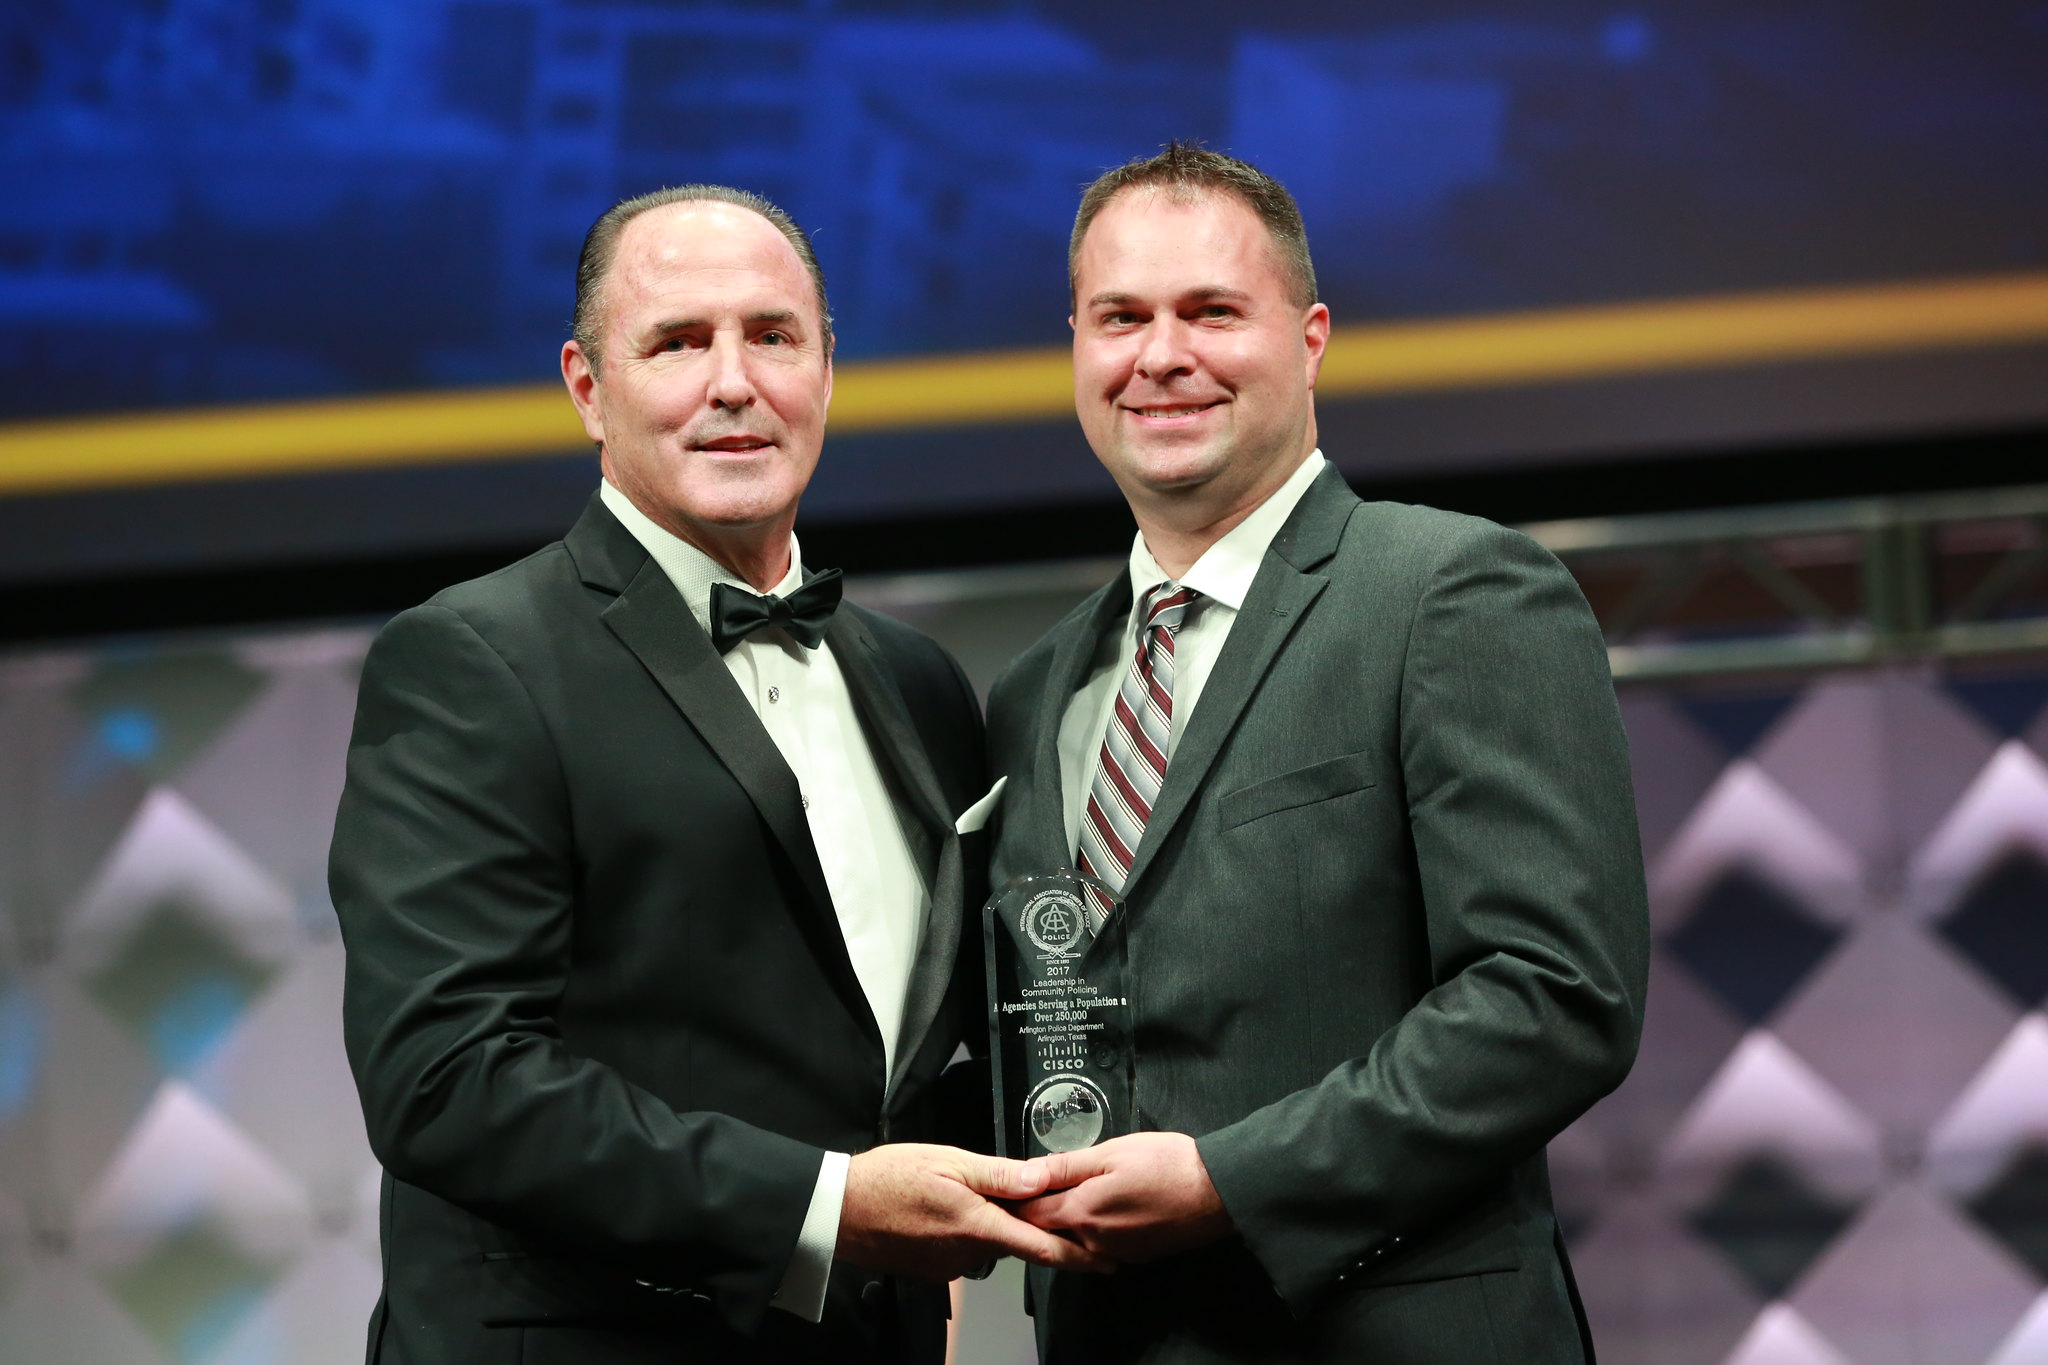 IACPCisco Leadership in Community Policing Award (Over 250K) - Arlington